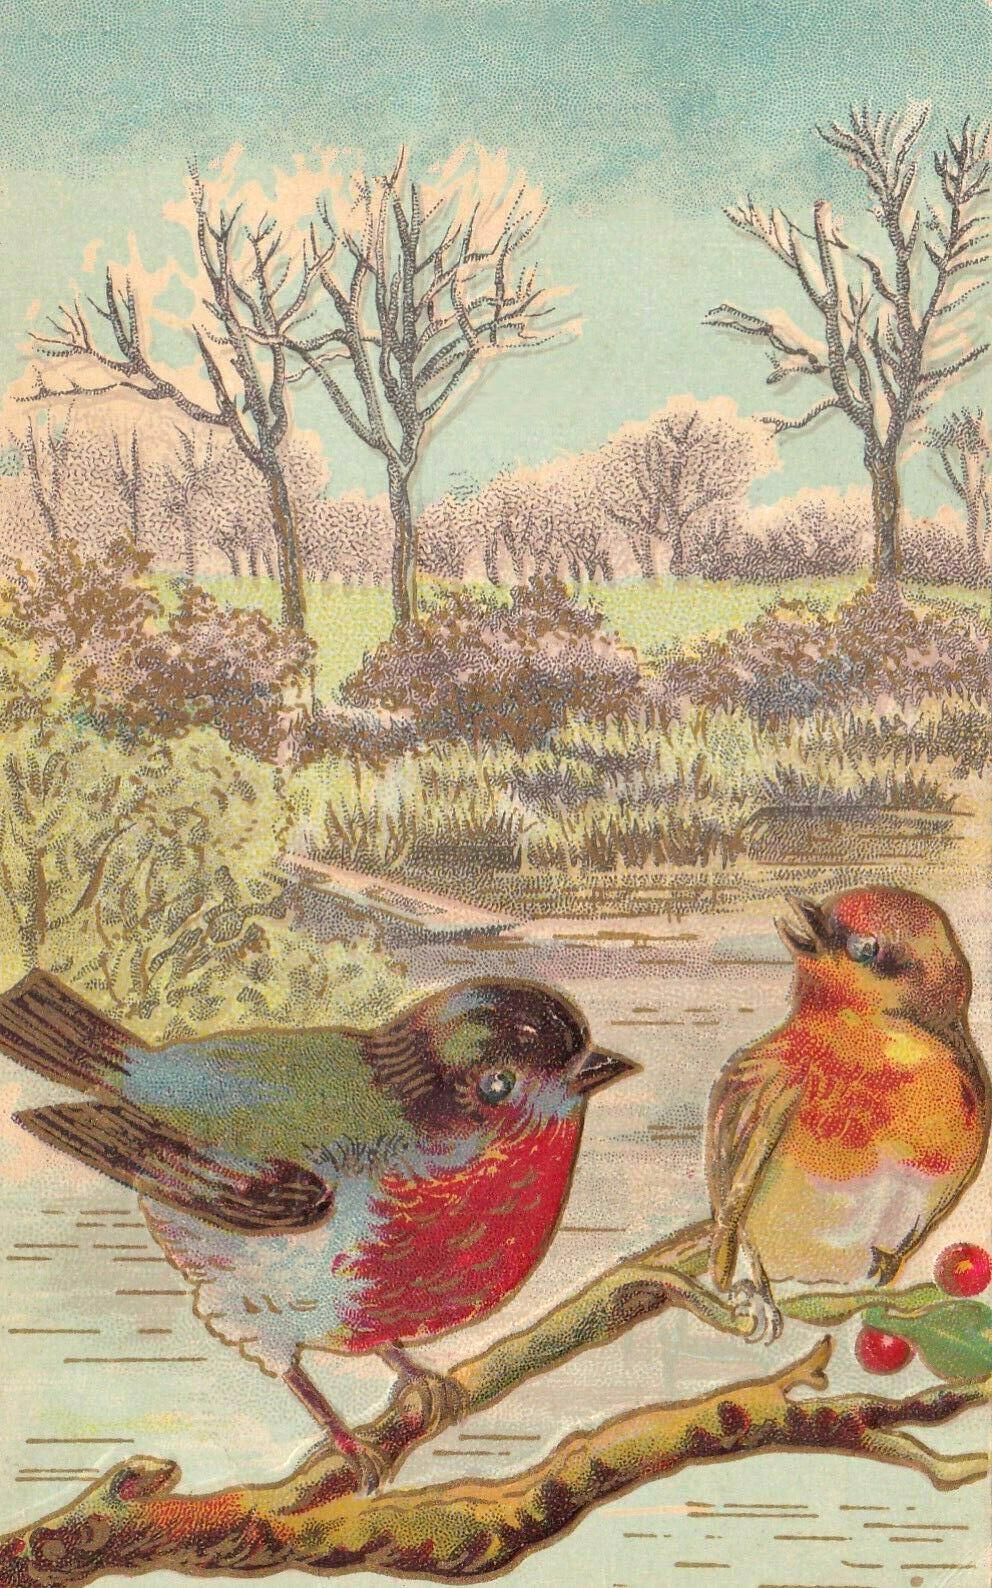 Vintage postcard illustration of two birds on a branch